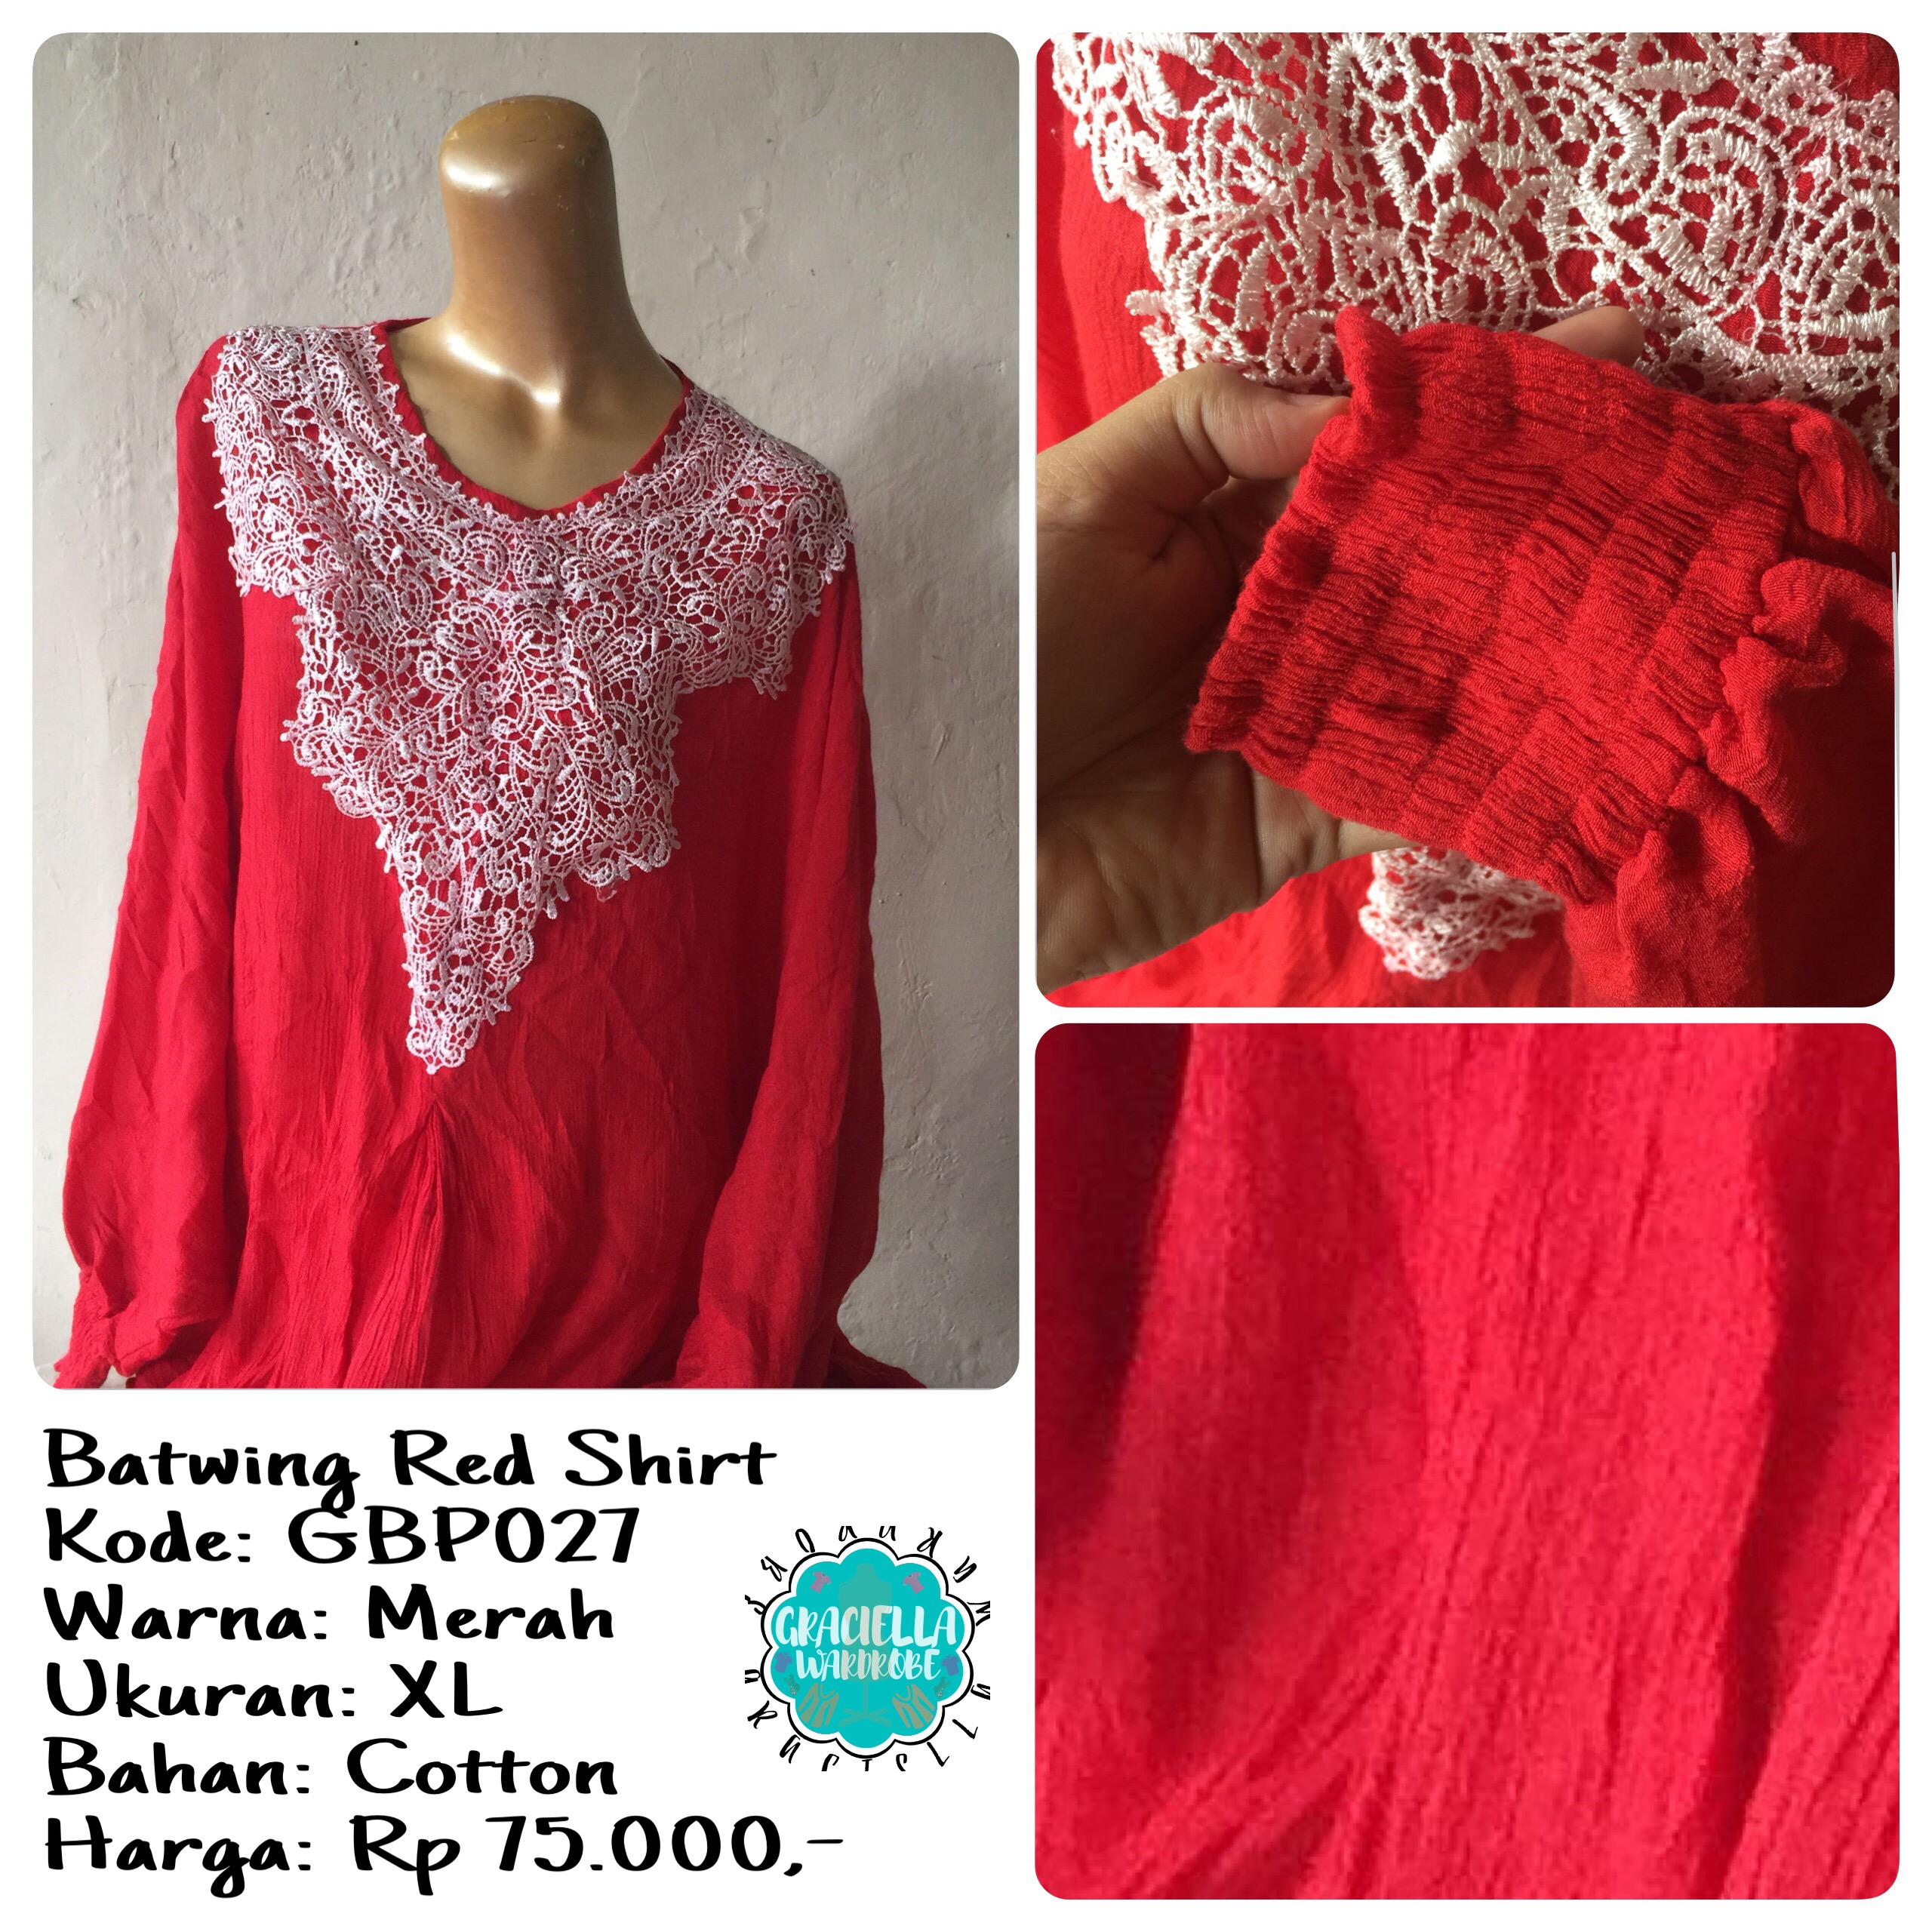 BATWING RED SHIRT